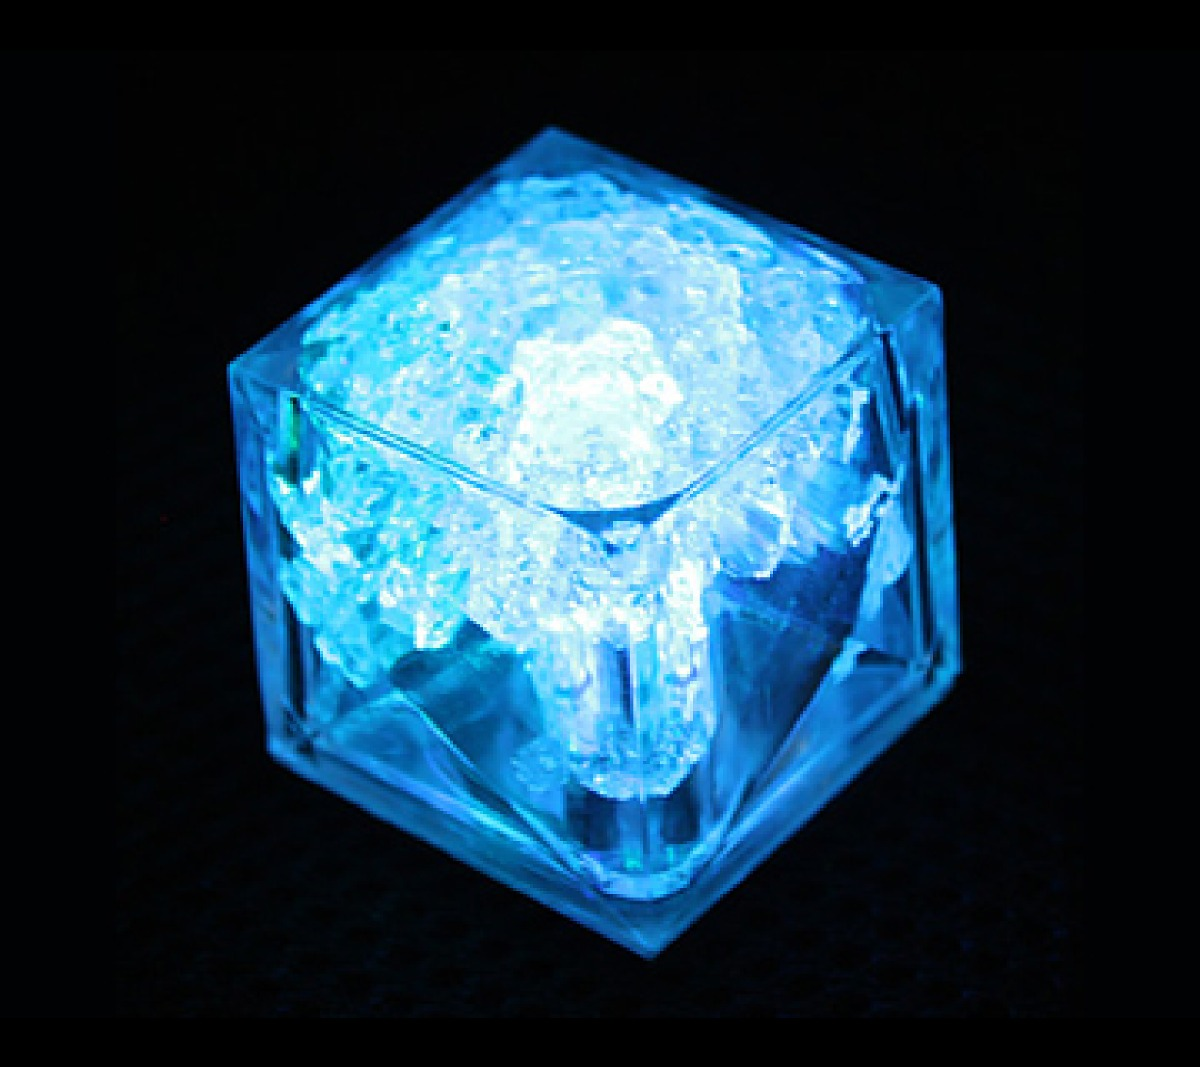 150 Cubos De Hielos Luminosos Led Sumergibles Colores -   1 444e8c3ff30